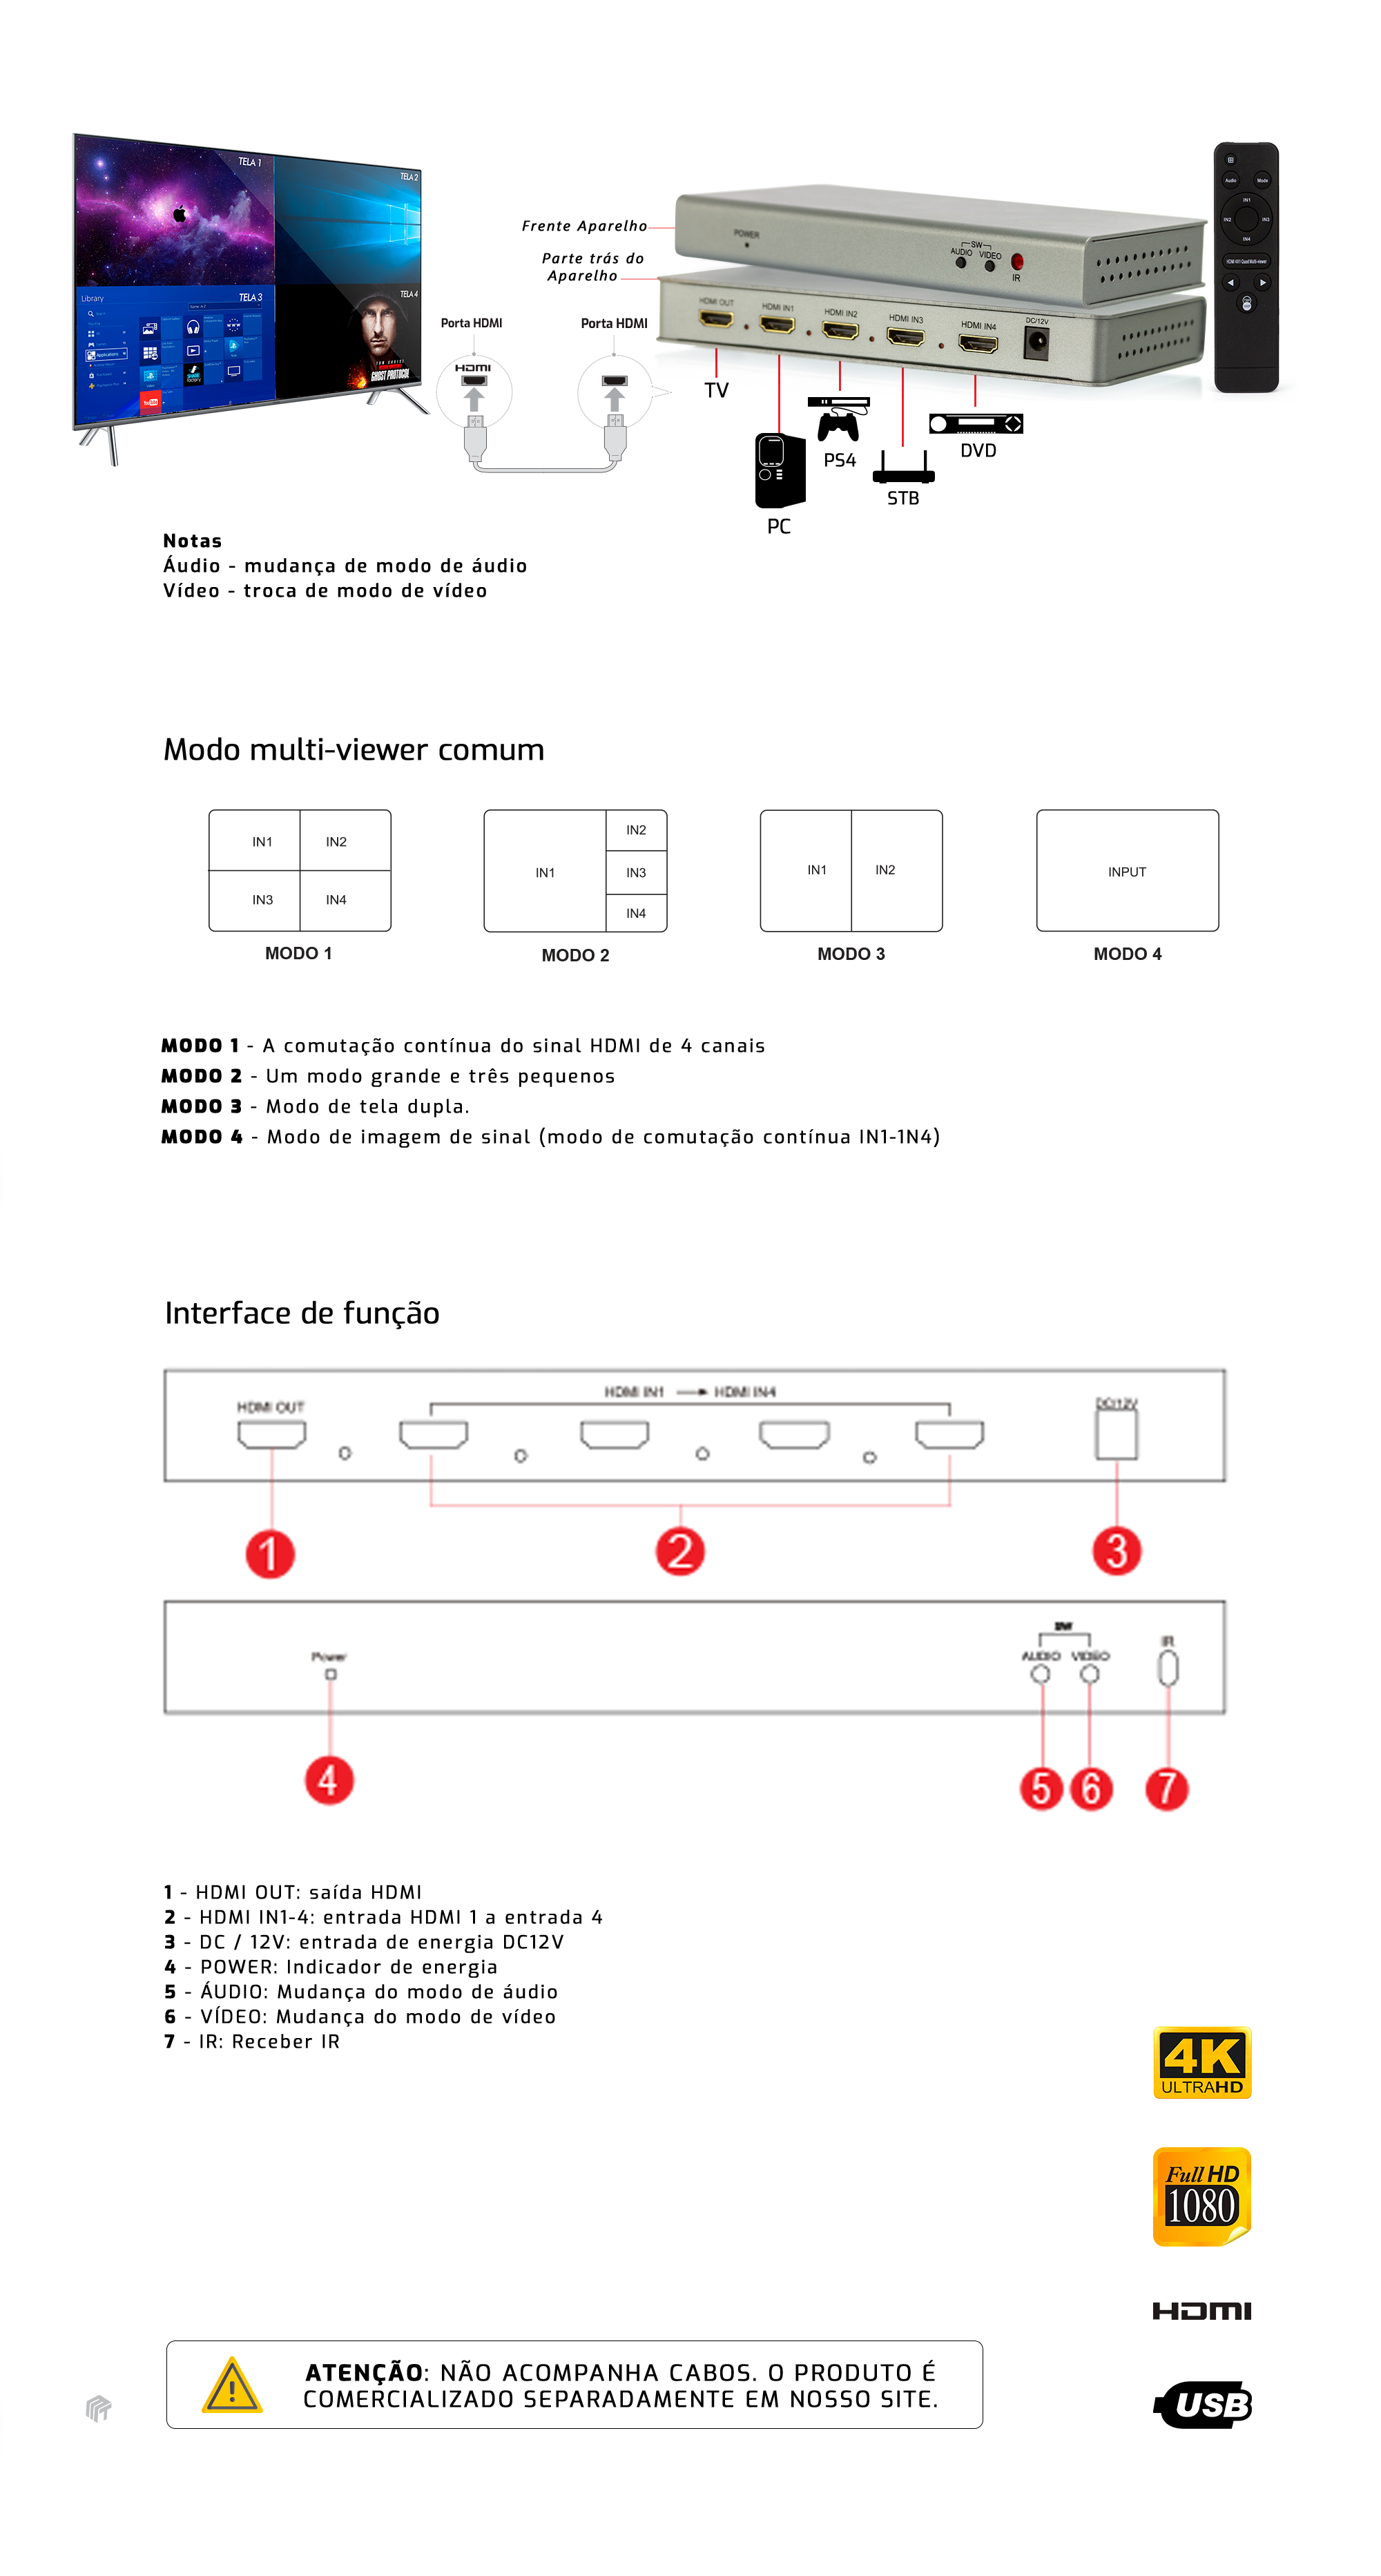 Multi-Viewer Switch HDMI 4x1